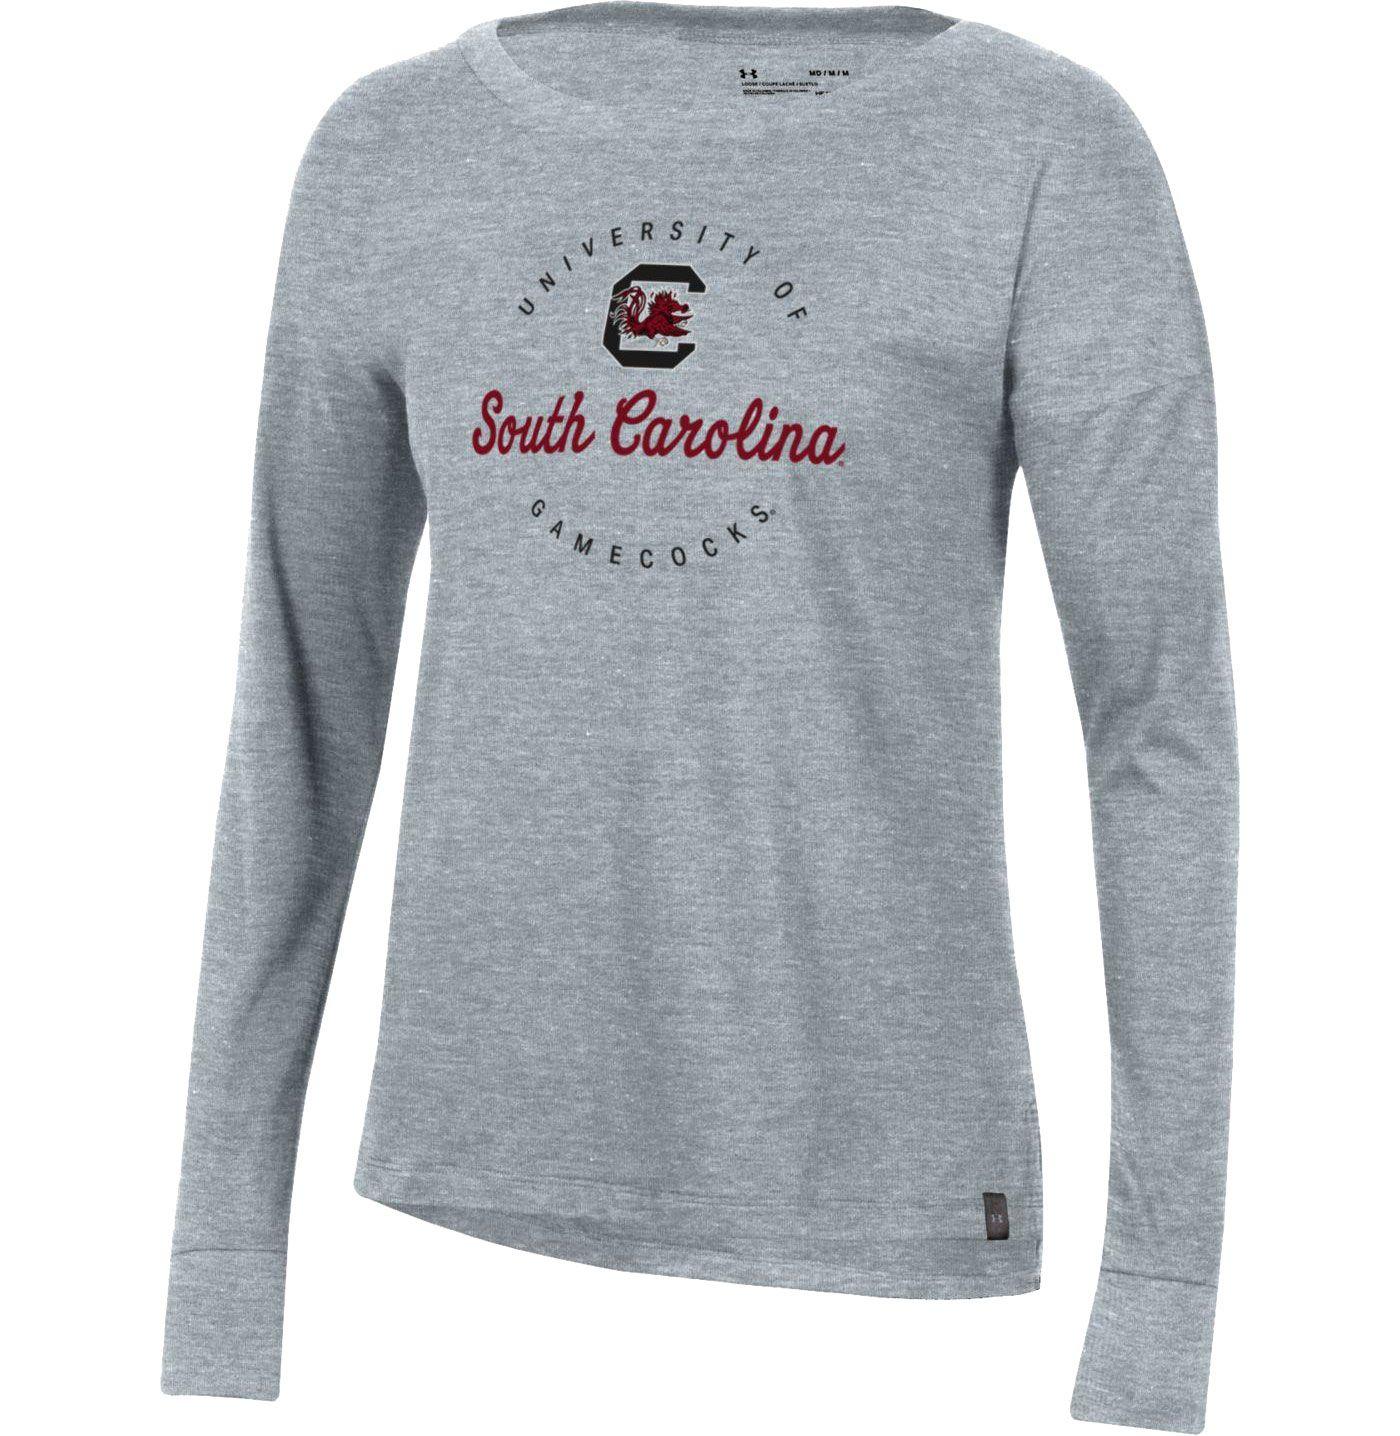 Under Armour Women's South Carolina Gamecocks Grey Performance Cotton Long Sleeve T-Shirt